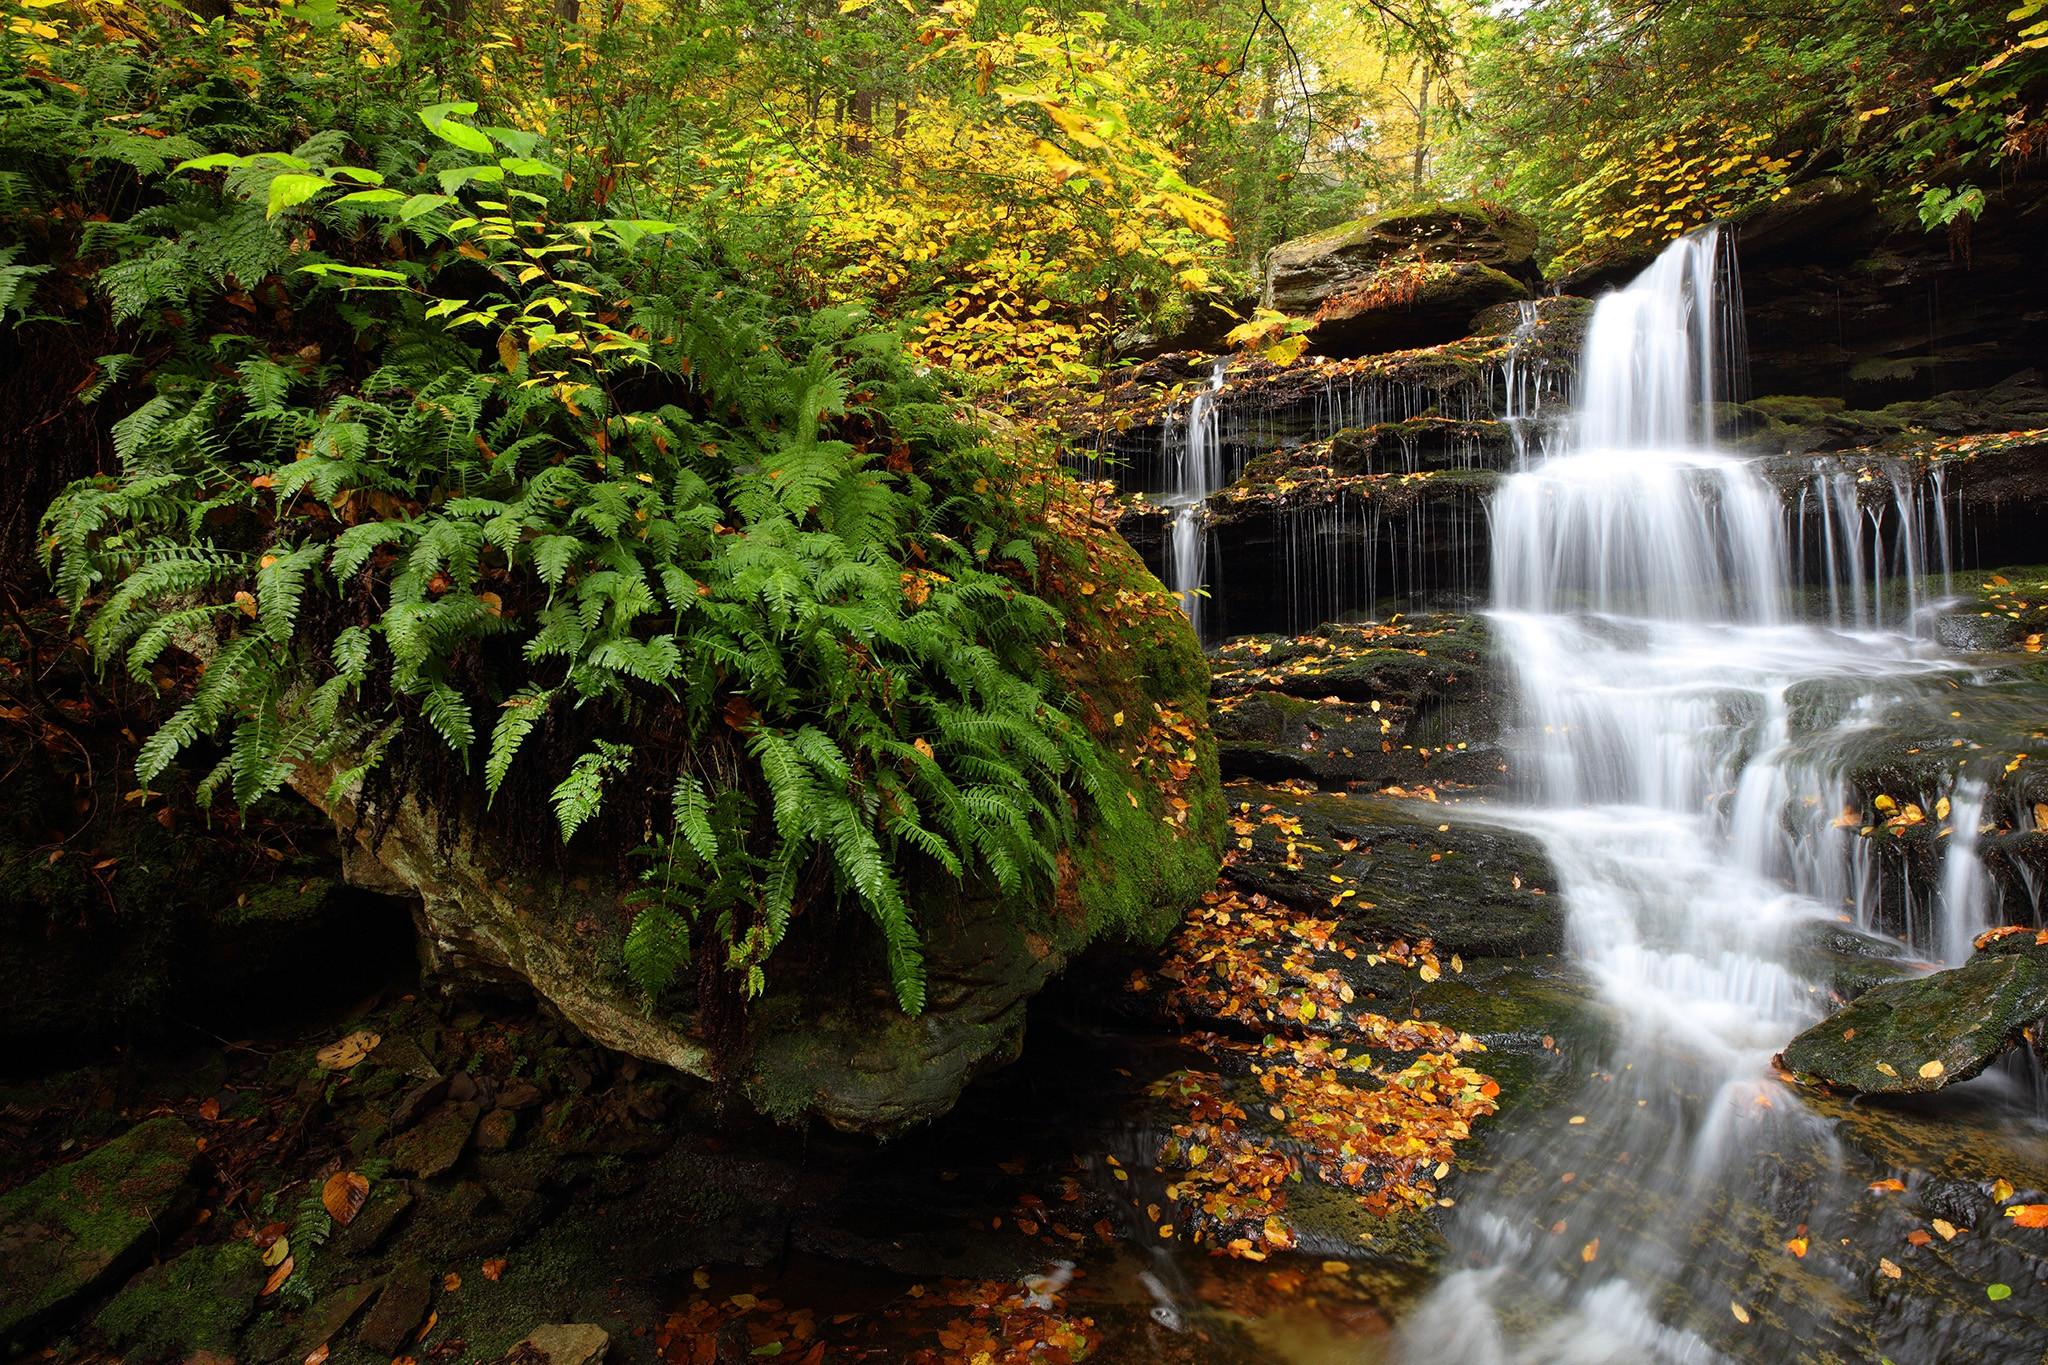 обои Hidden Falls, Rickets Glen State Park, осень, водопал картинки фото